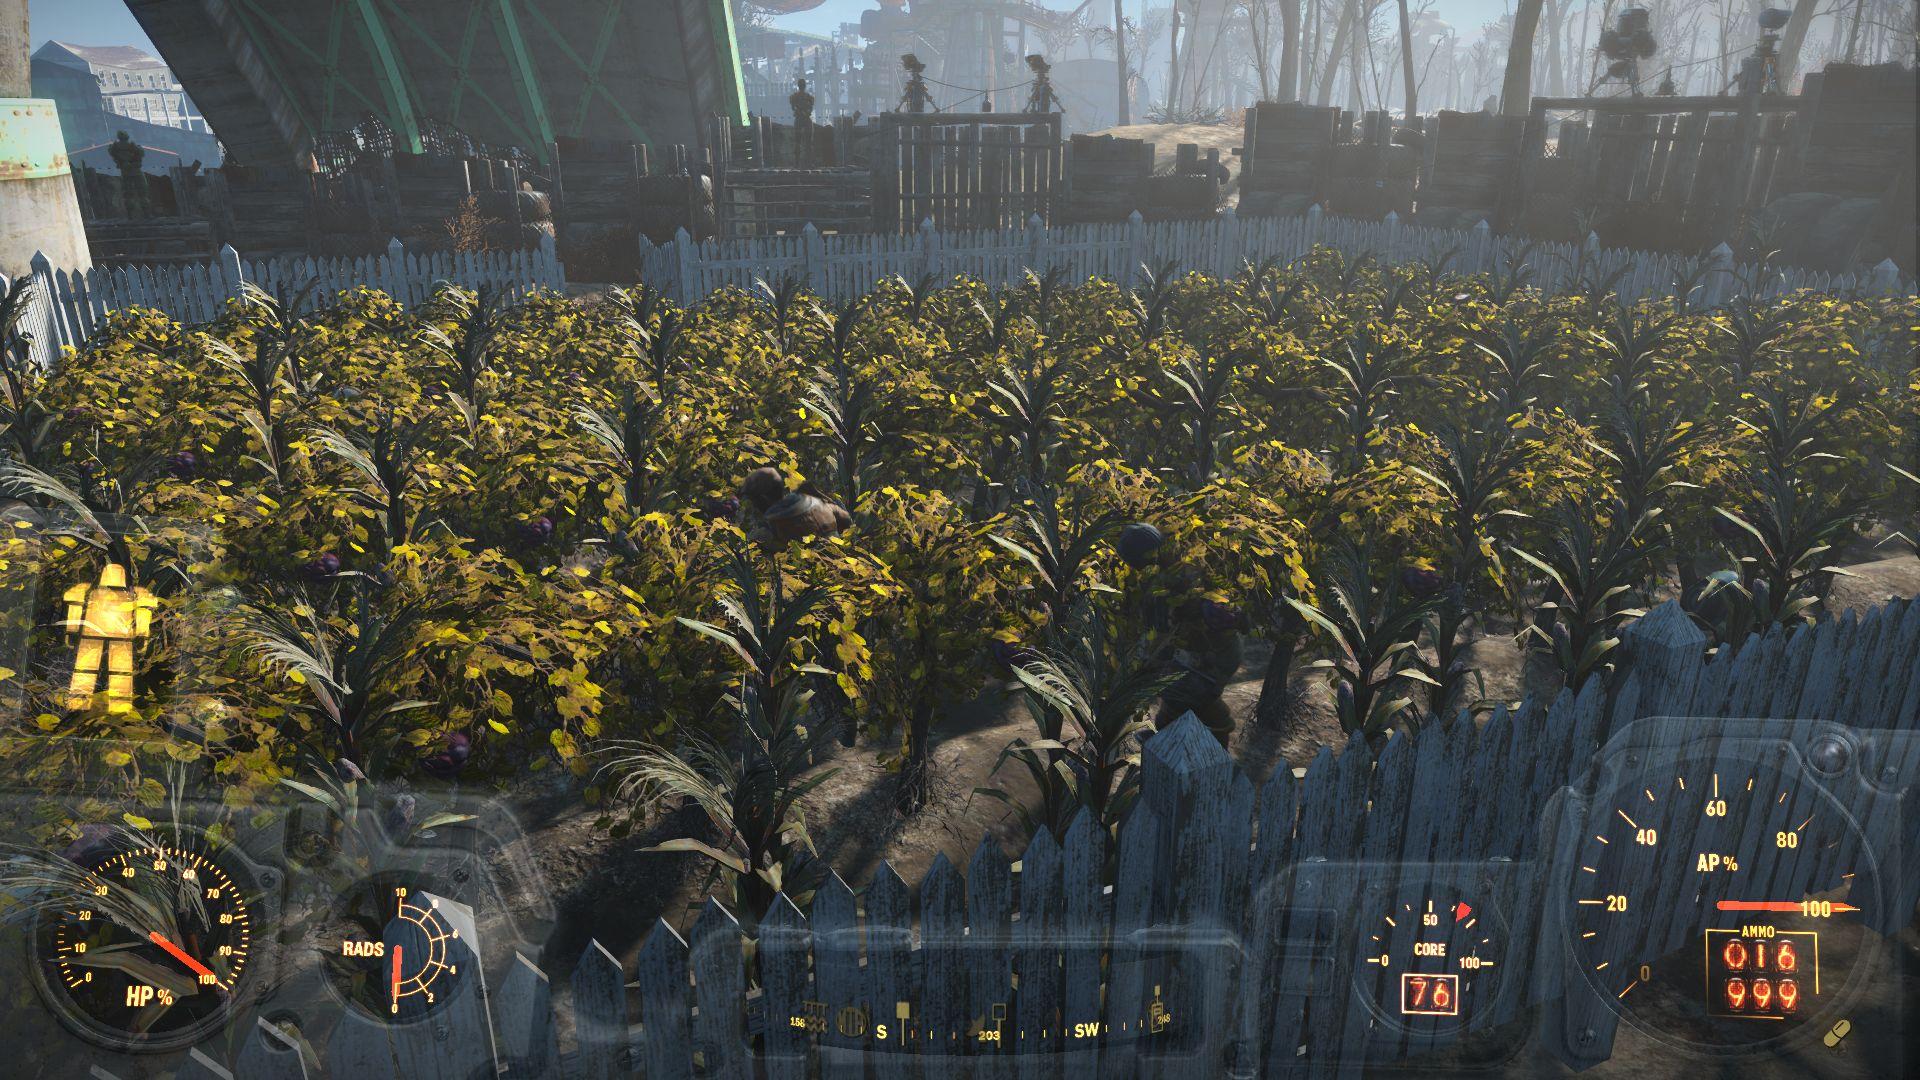 окучивание огорода - Fallout 4 кукуруза, мутафрукт, окучивание, поселенцы, Ферма Финча